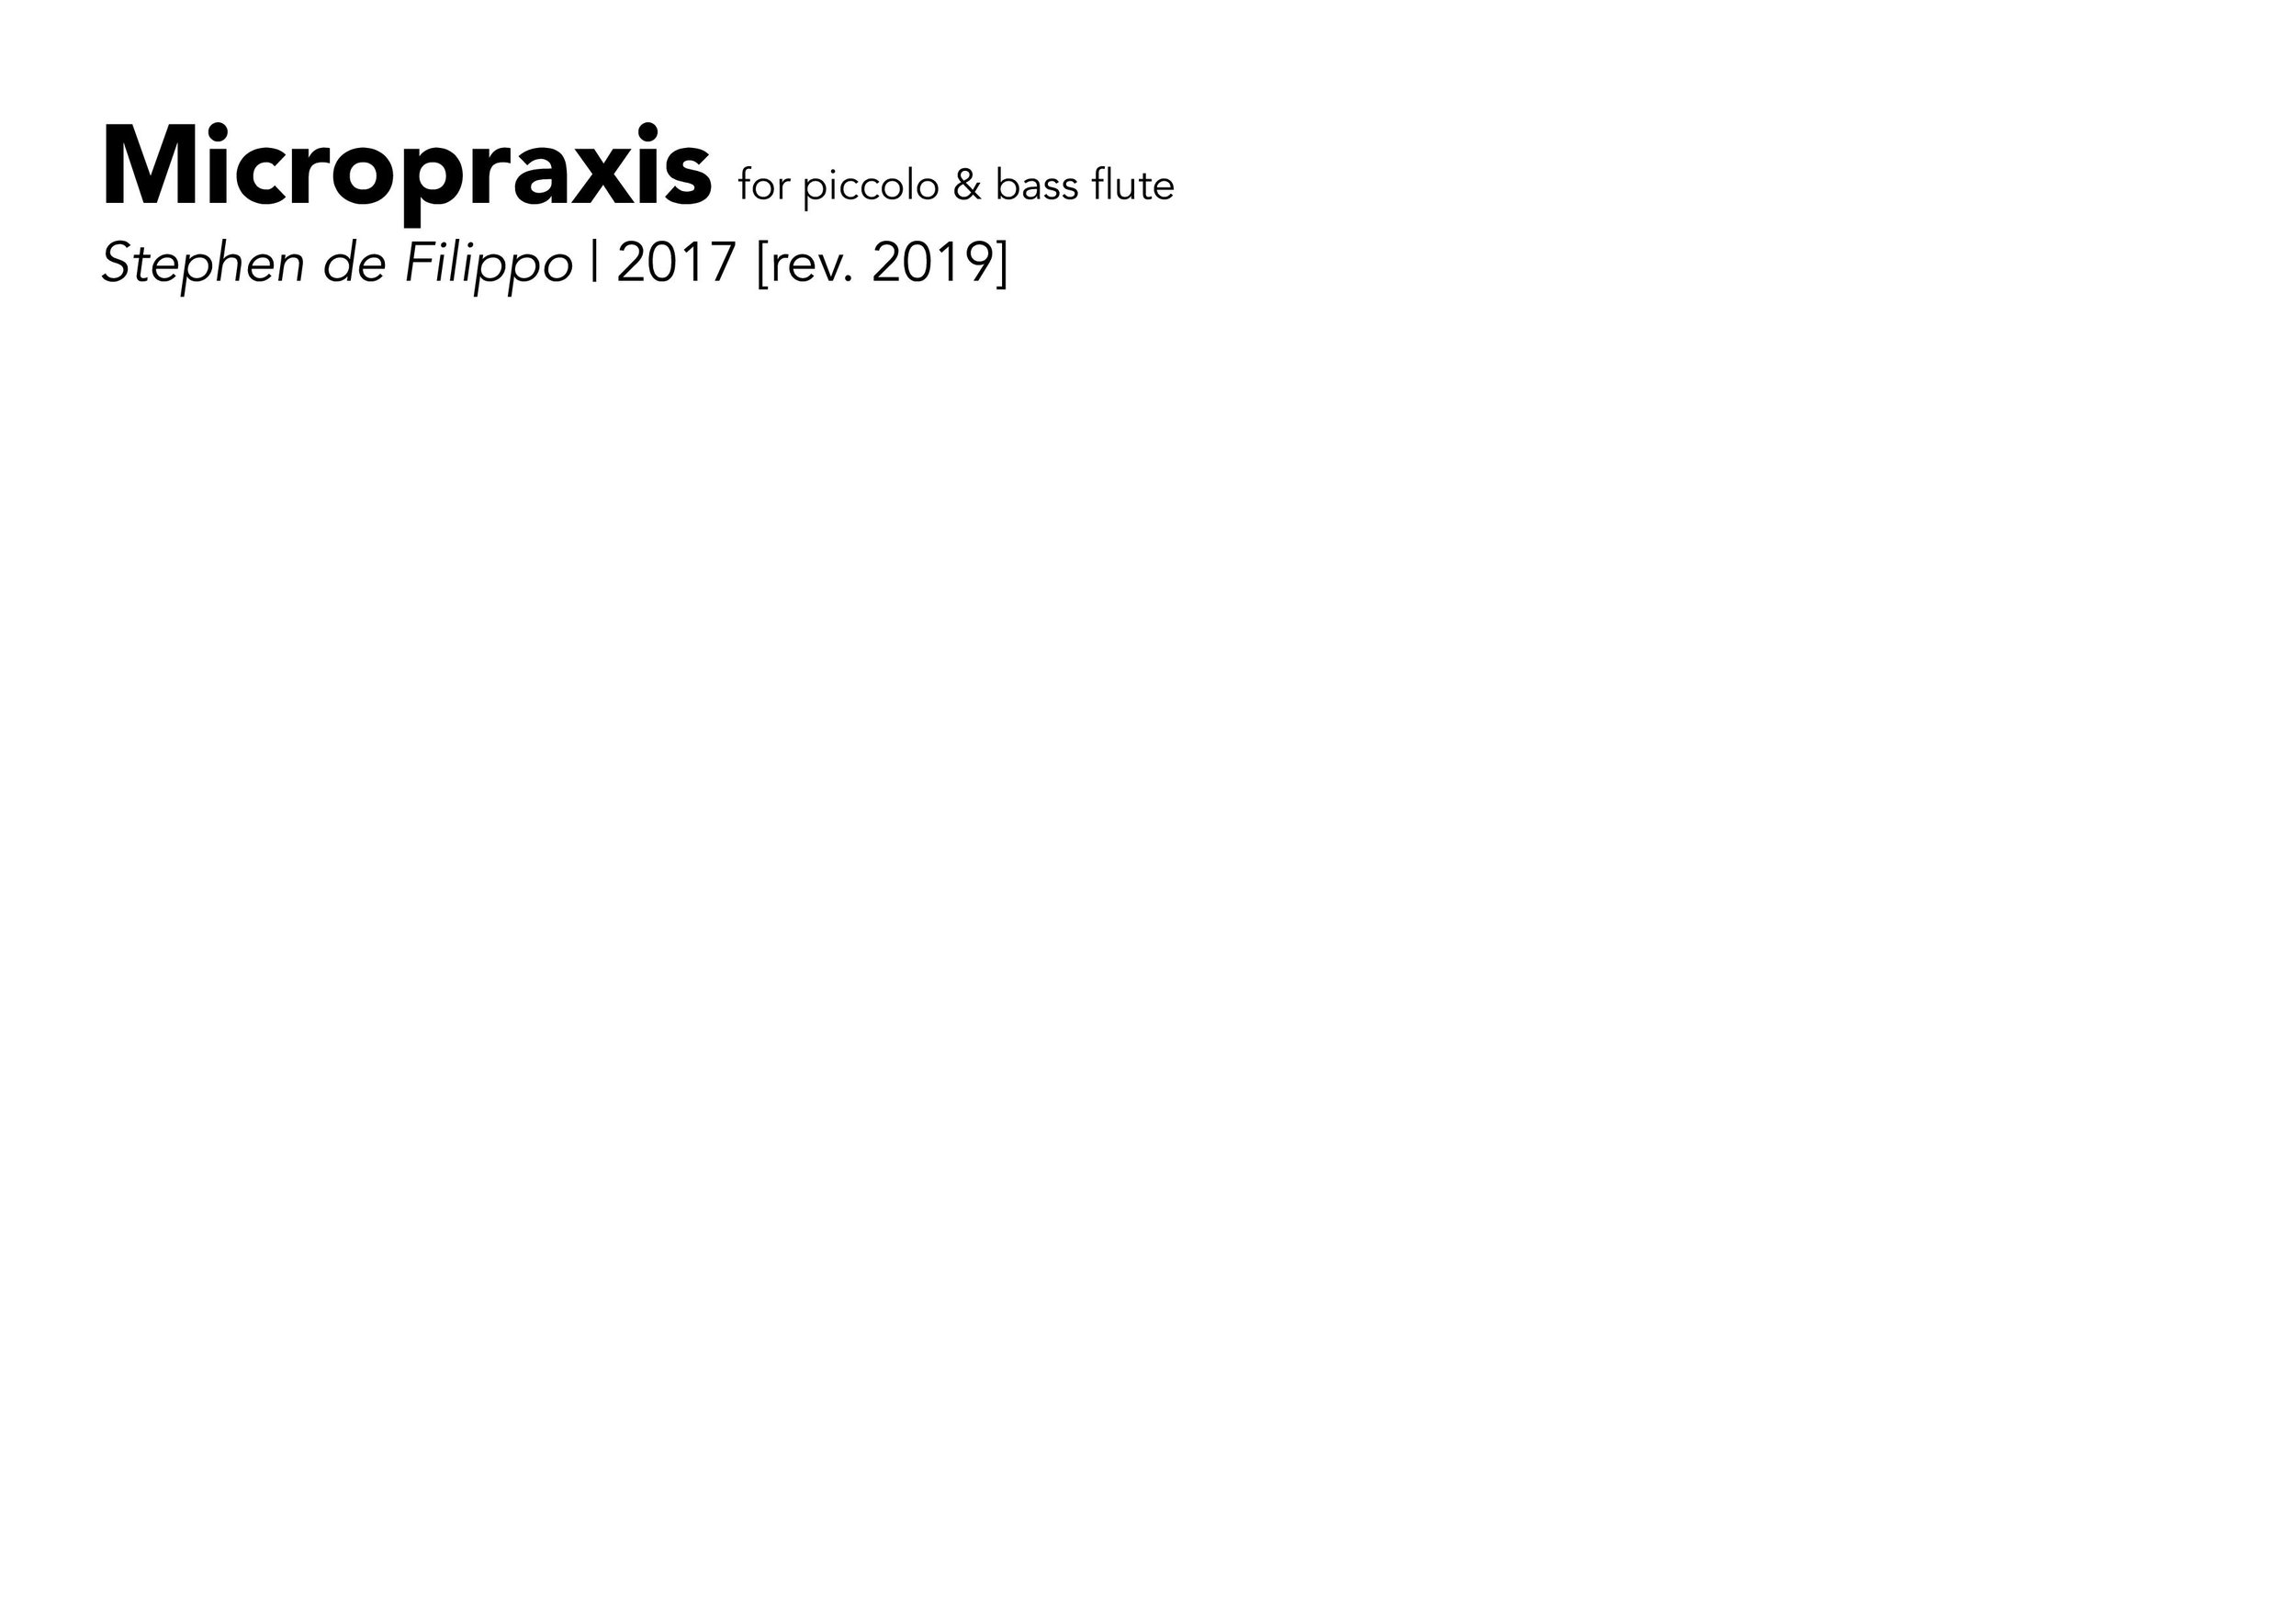 Micropraxis-page-001.jpg